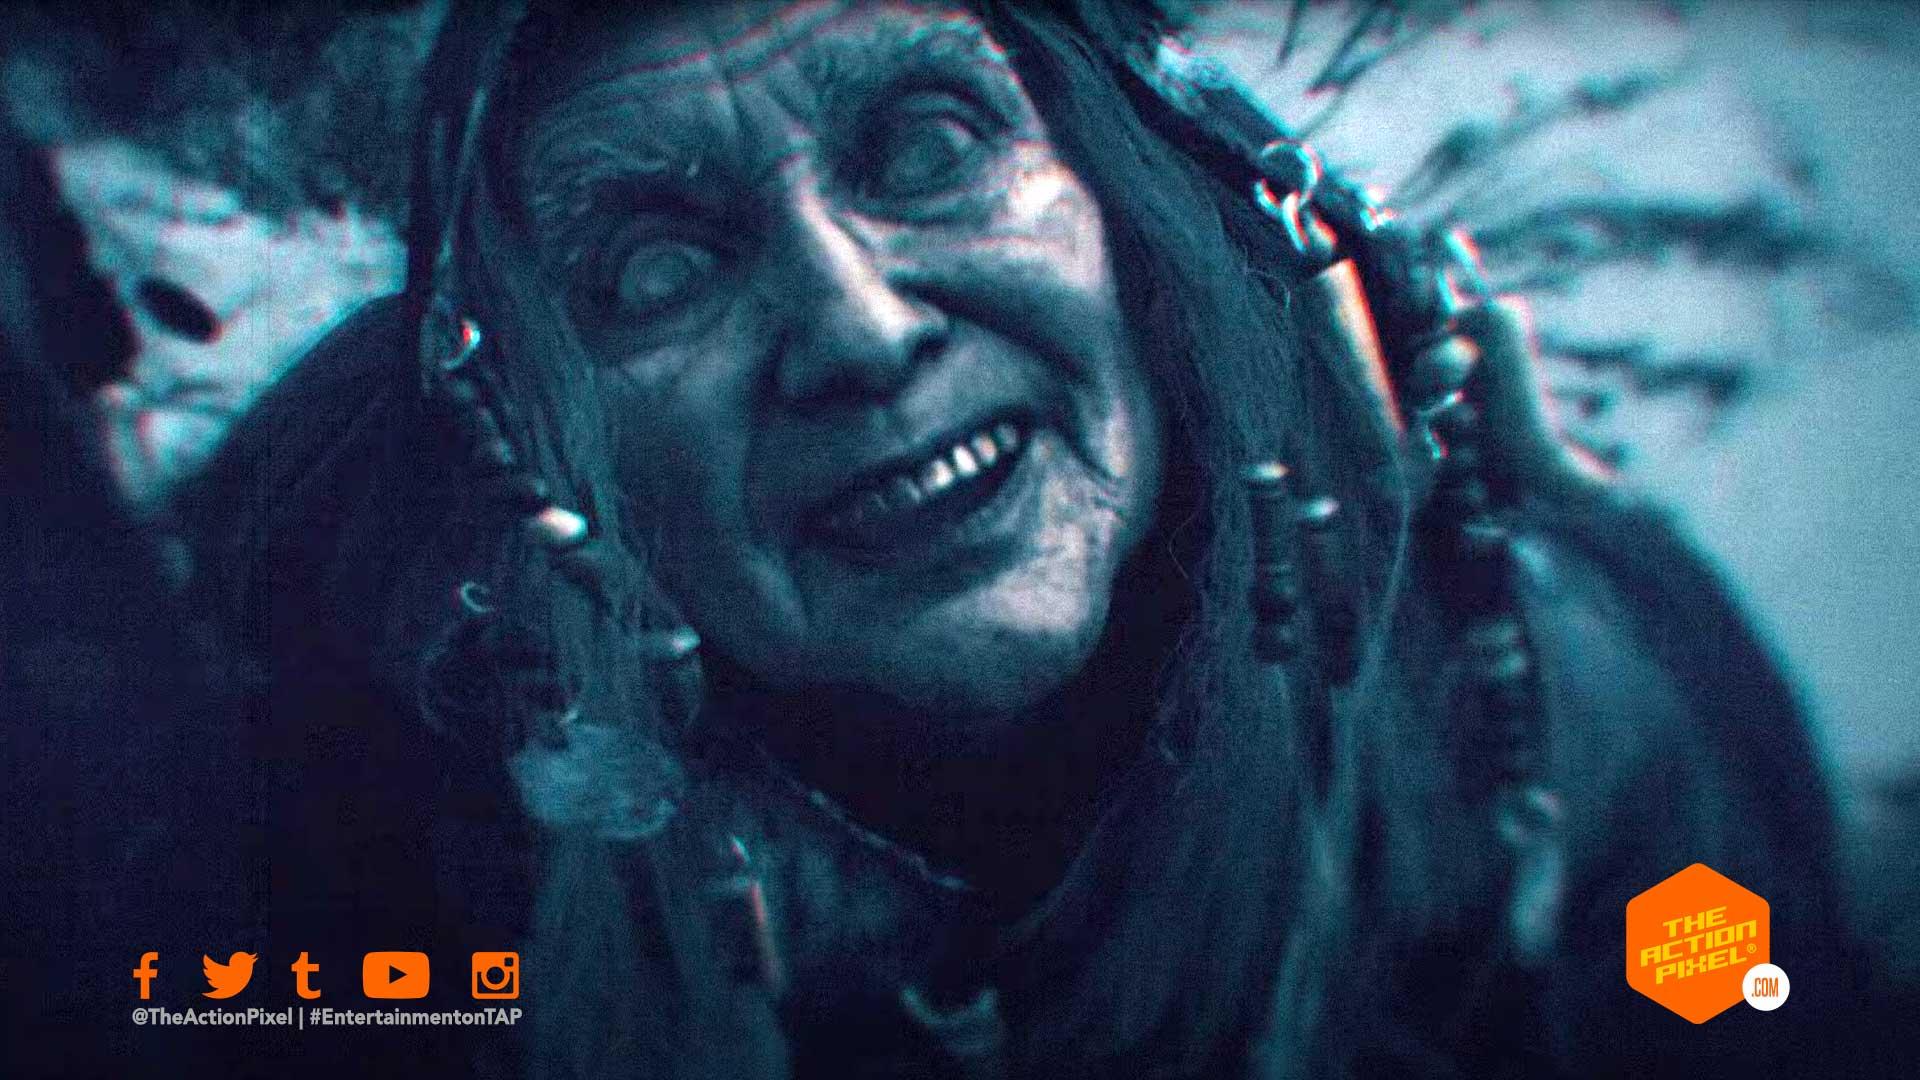 resident evil, biohazard, zombies undead, chris redfield, ethan winters, survival horror, RE8, FPS, village, action, PlayStation 5, resident evil 8, resident evil village, resident evil village 2nd trailer, resident evil village trailer, entertainment on tap, the action pixel